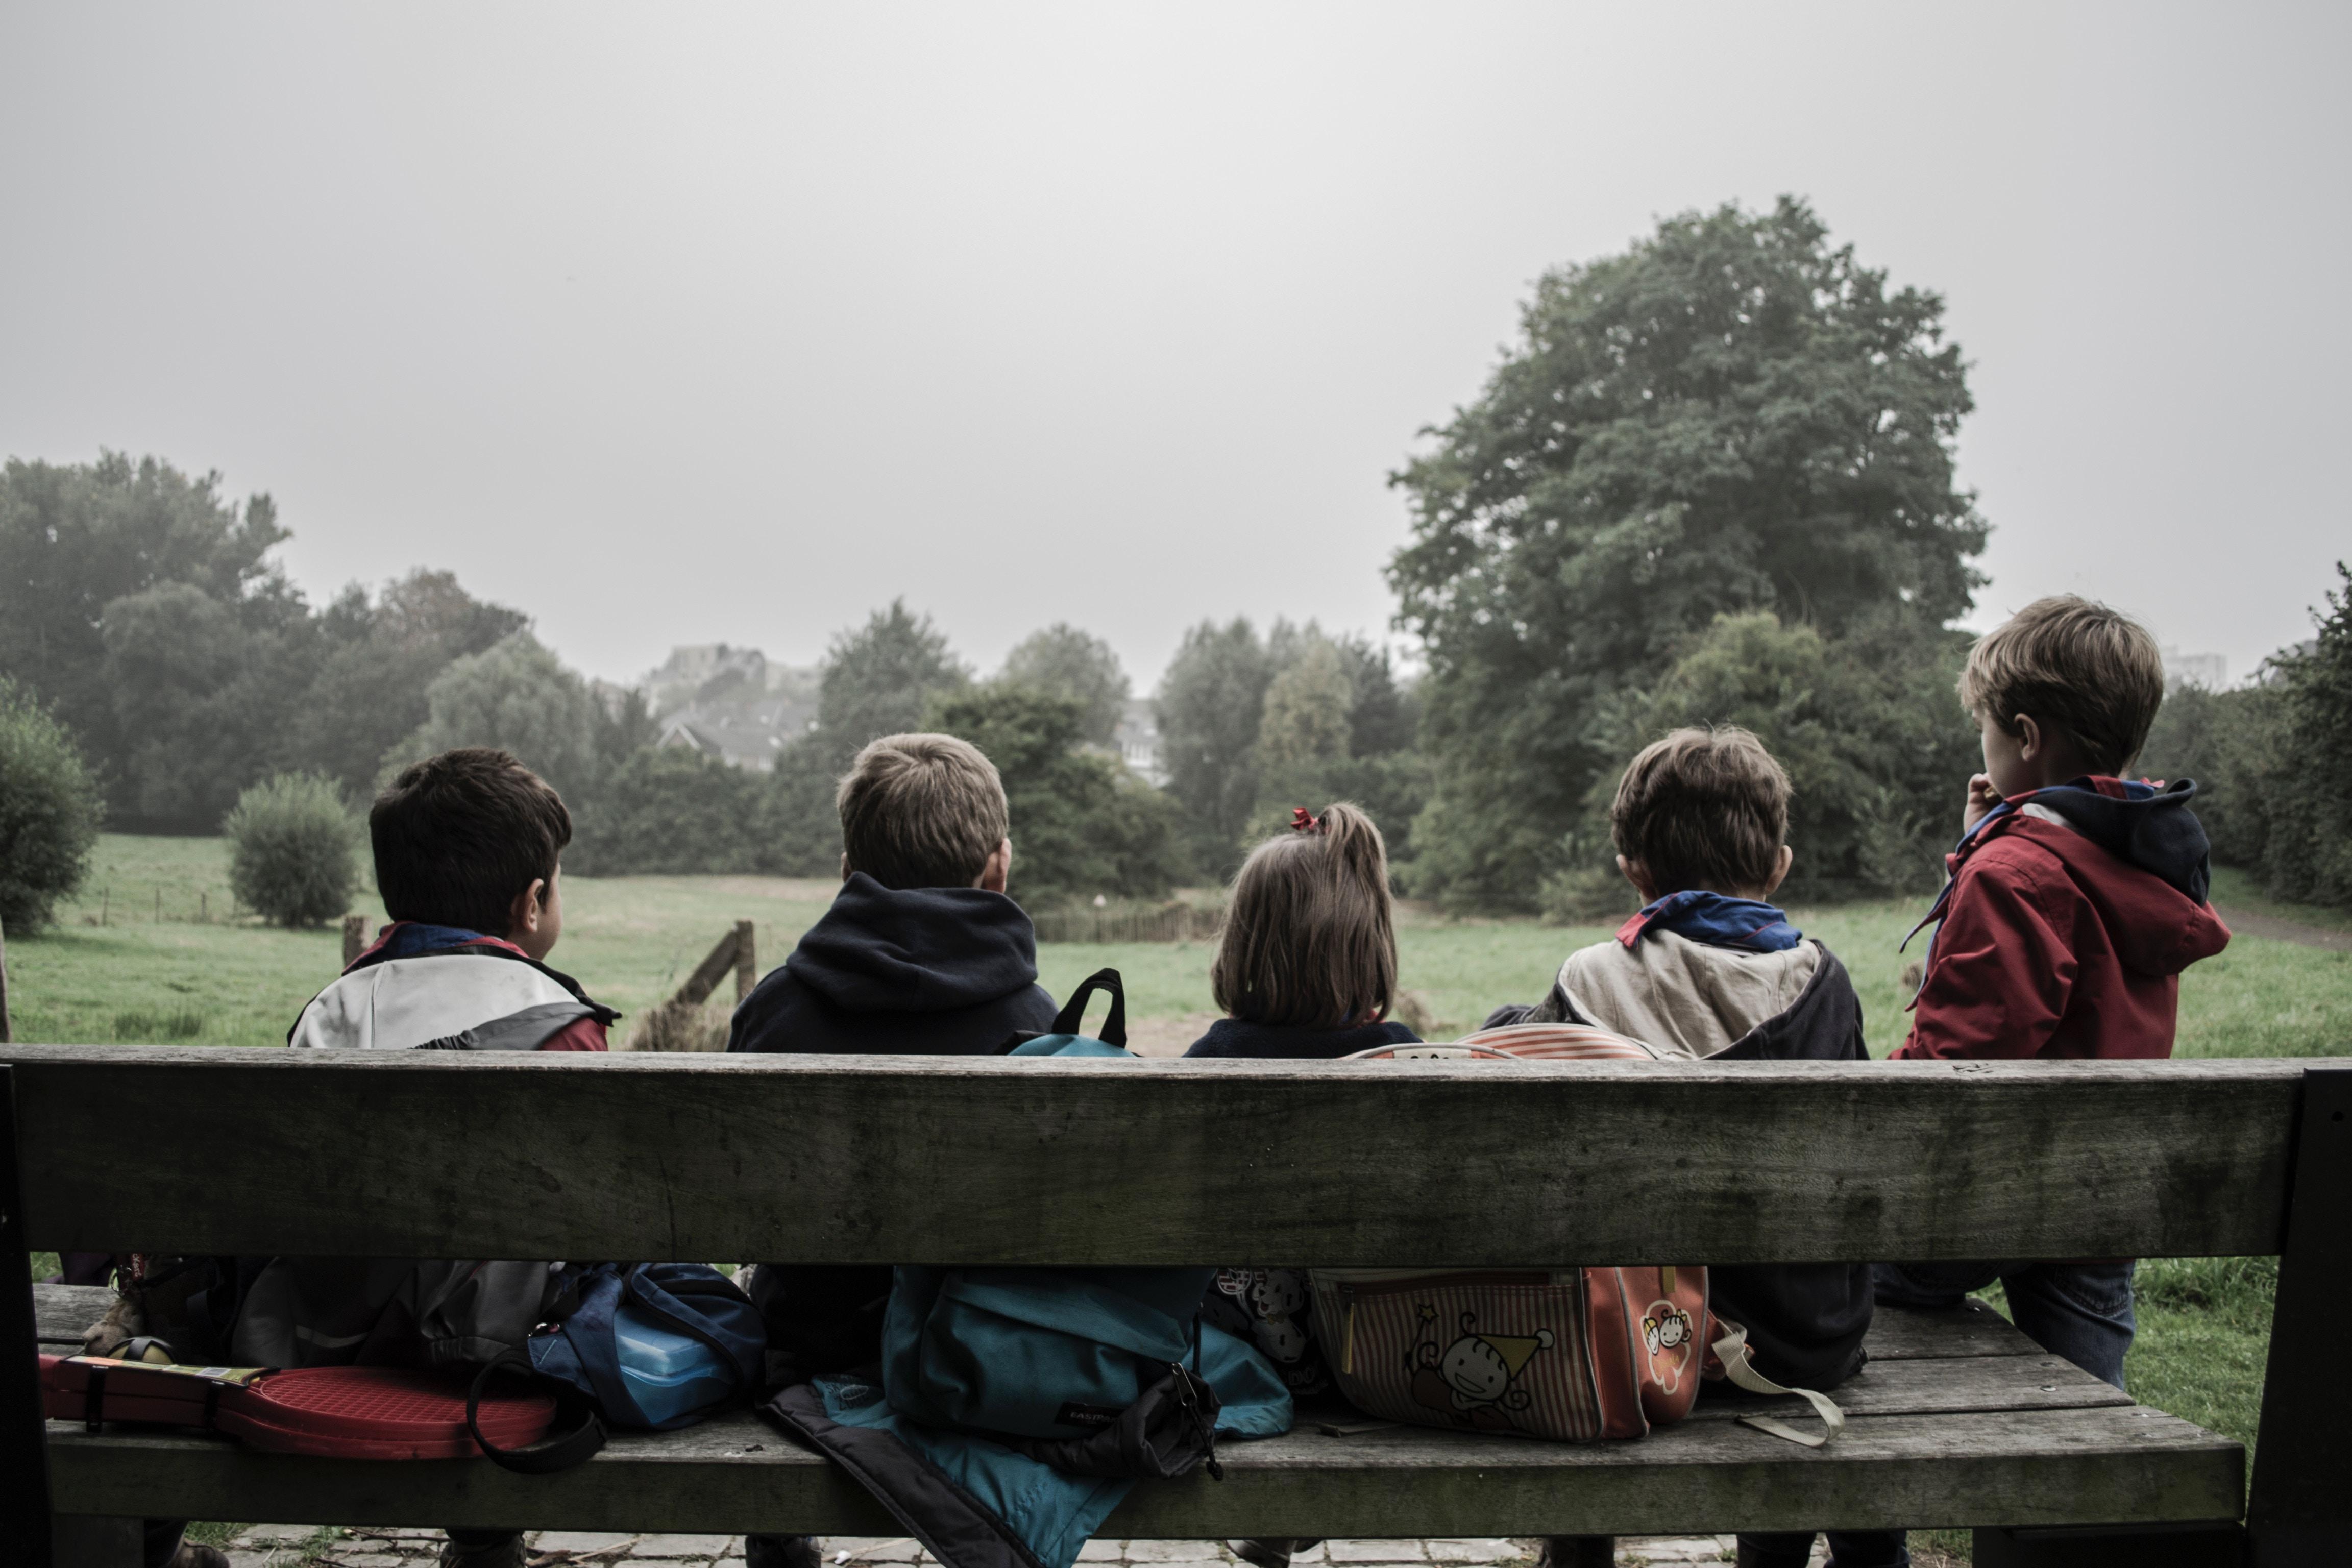 Speech therapy socialization barriers kids in park